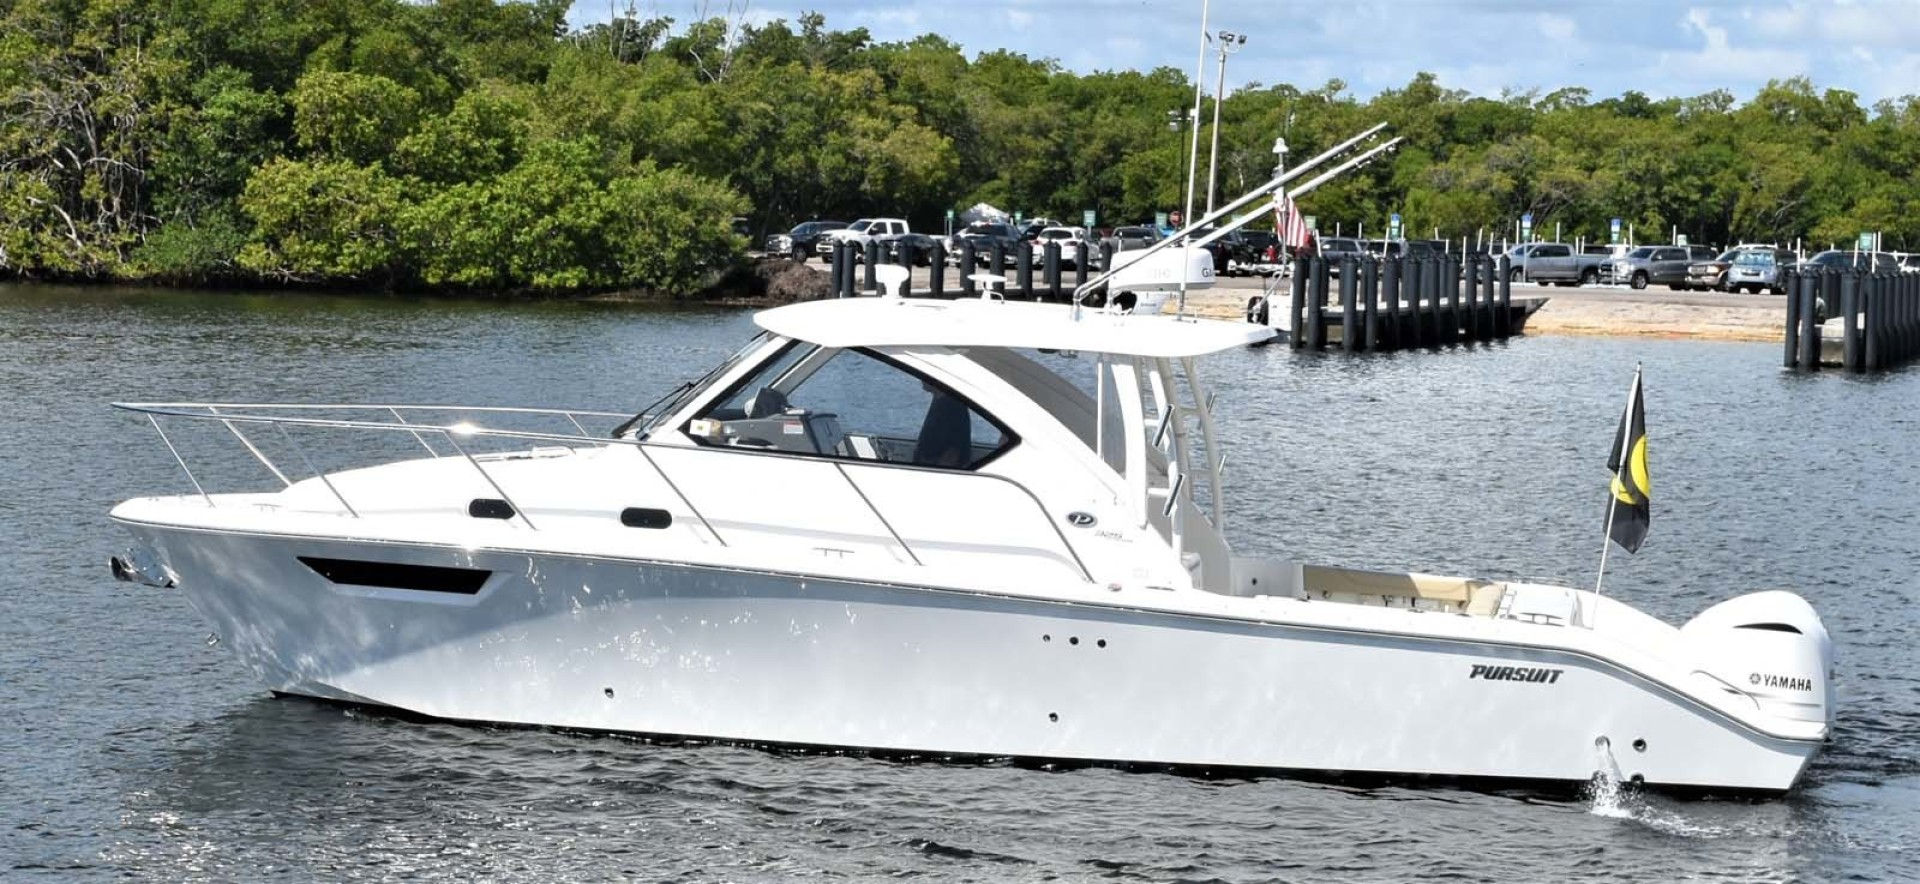 Pursuit-325 Offshore 2020-Coo Coo Miami-Florida-United States-Port Profile-1475271 | Thumbnail